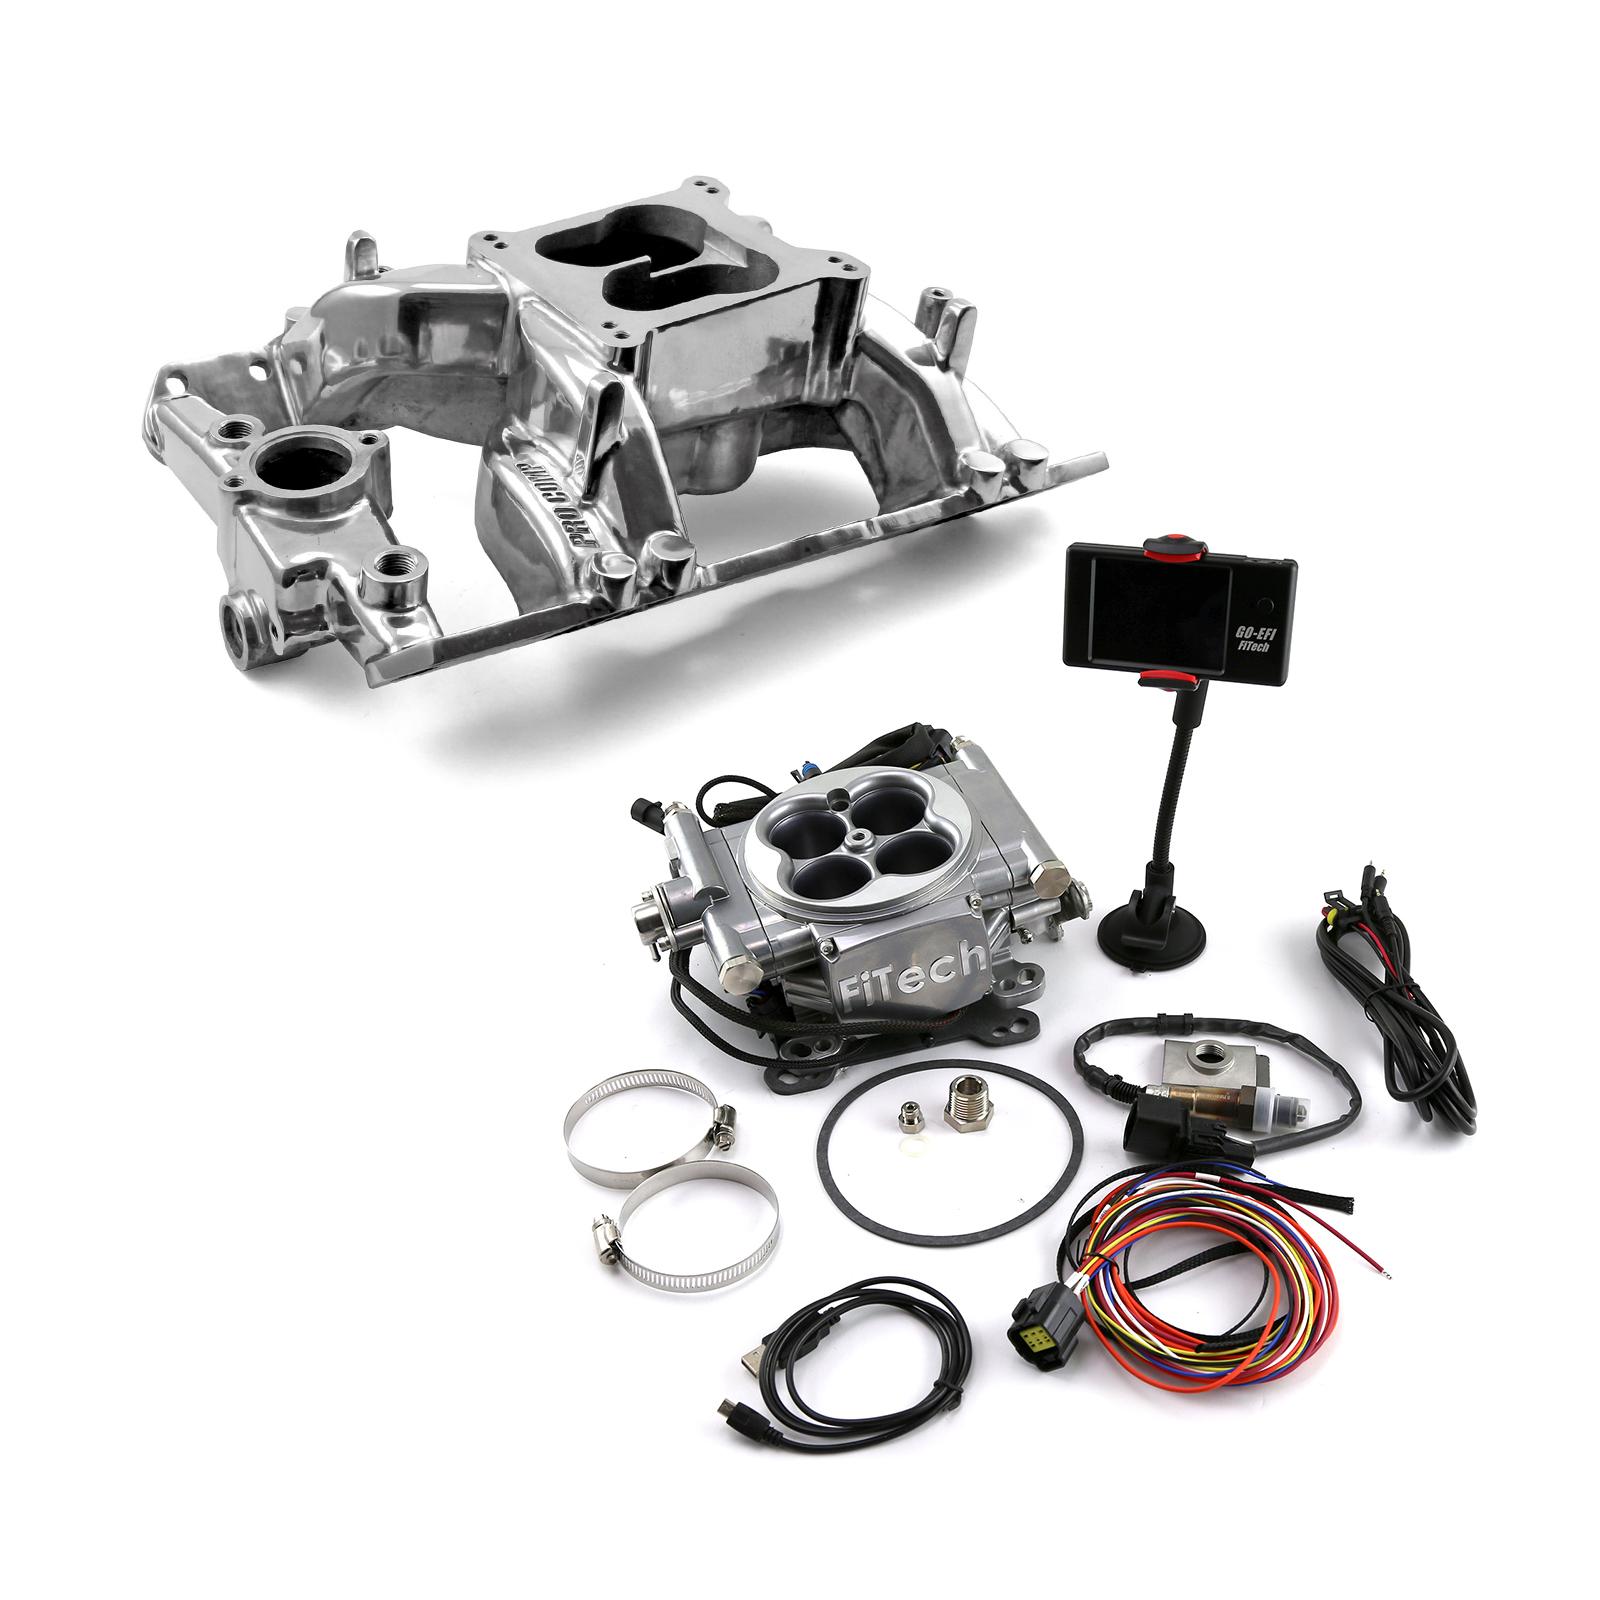 Pontiac V8 Eliminator Manifold & FiTech Go EFI 30001 Fuel Injection